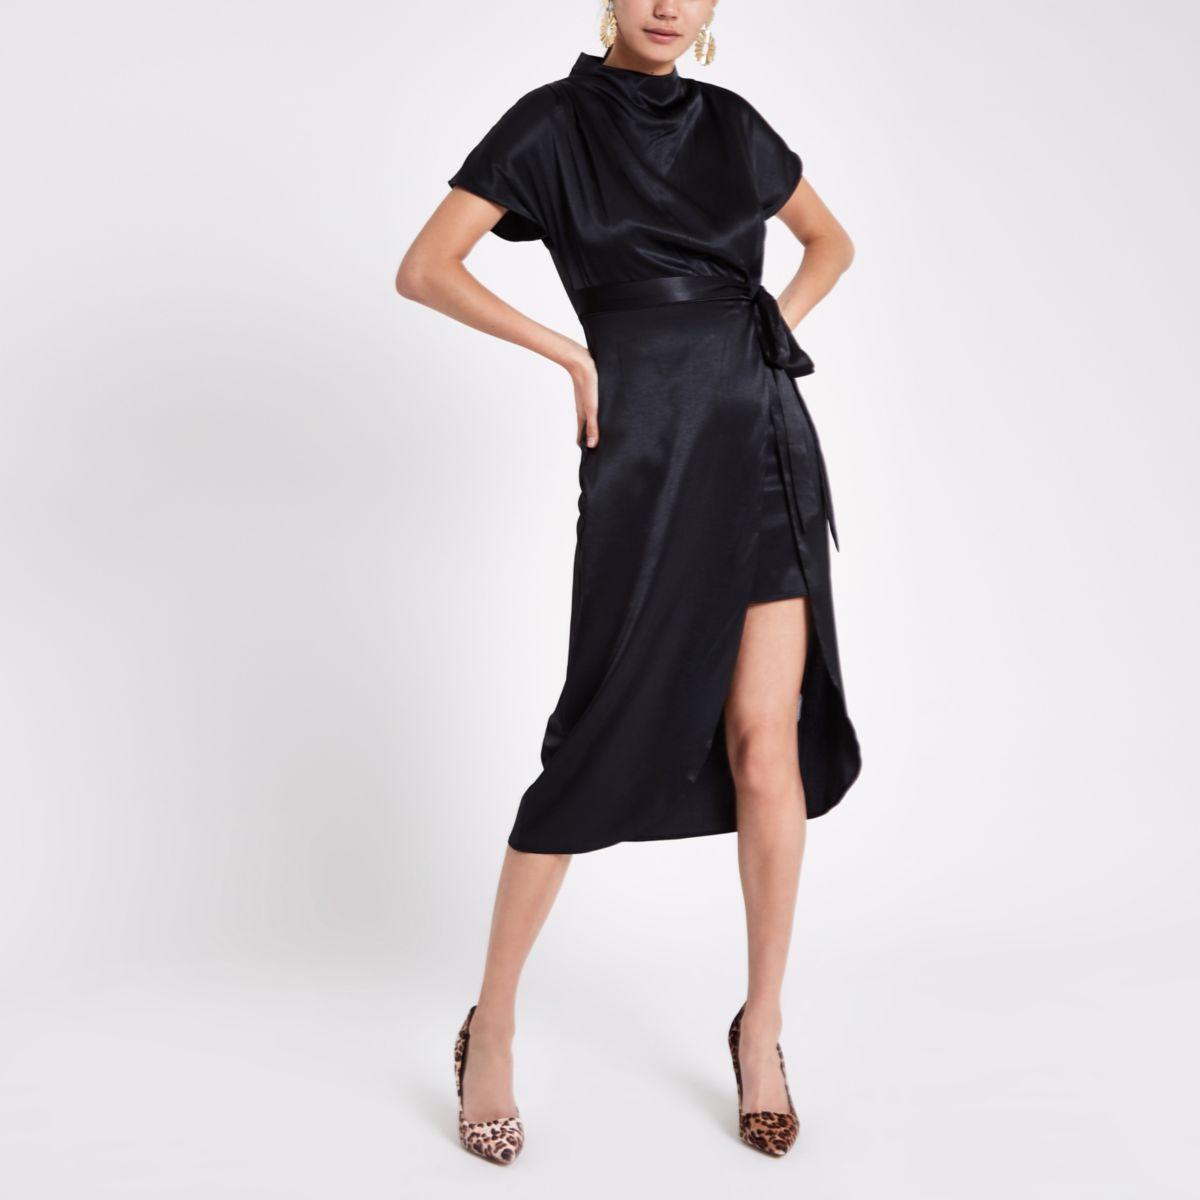 Schwarzes, hochgeschlossenes Kleid